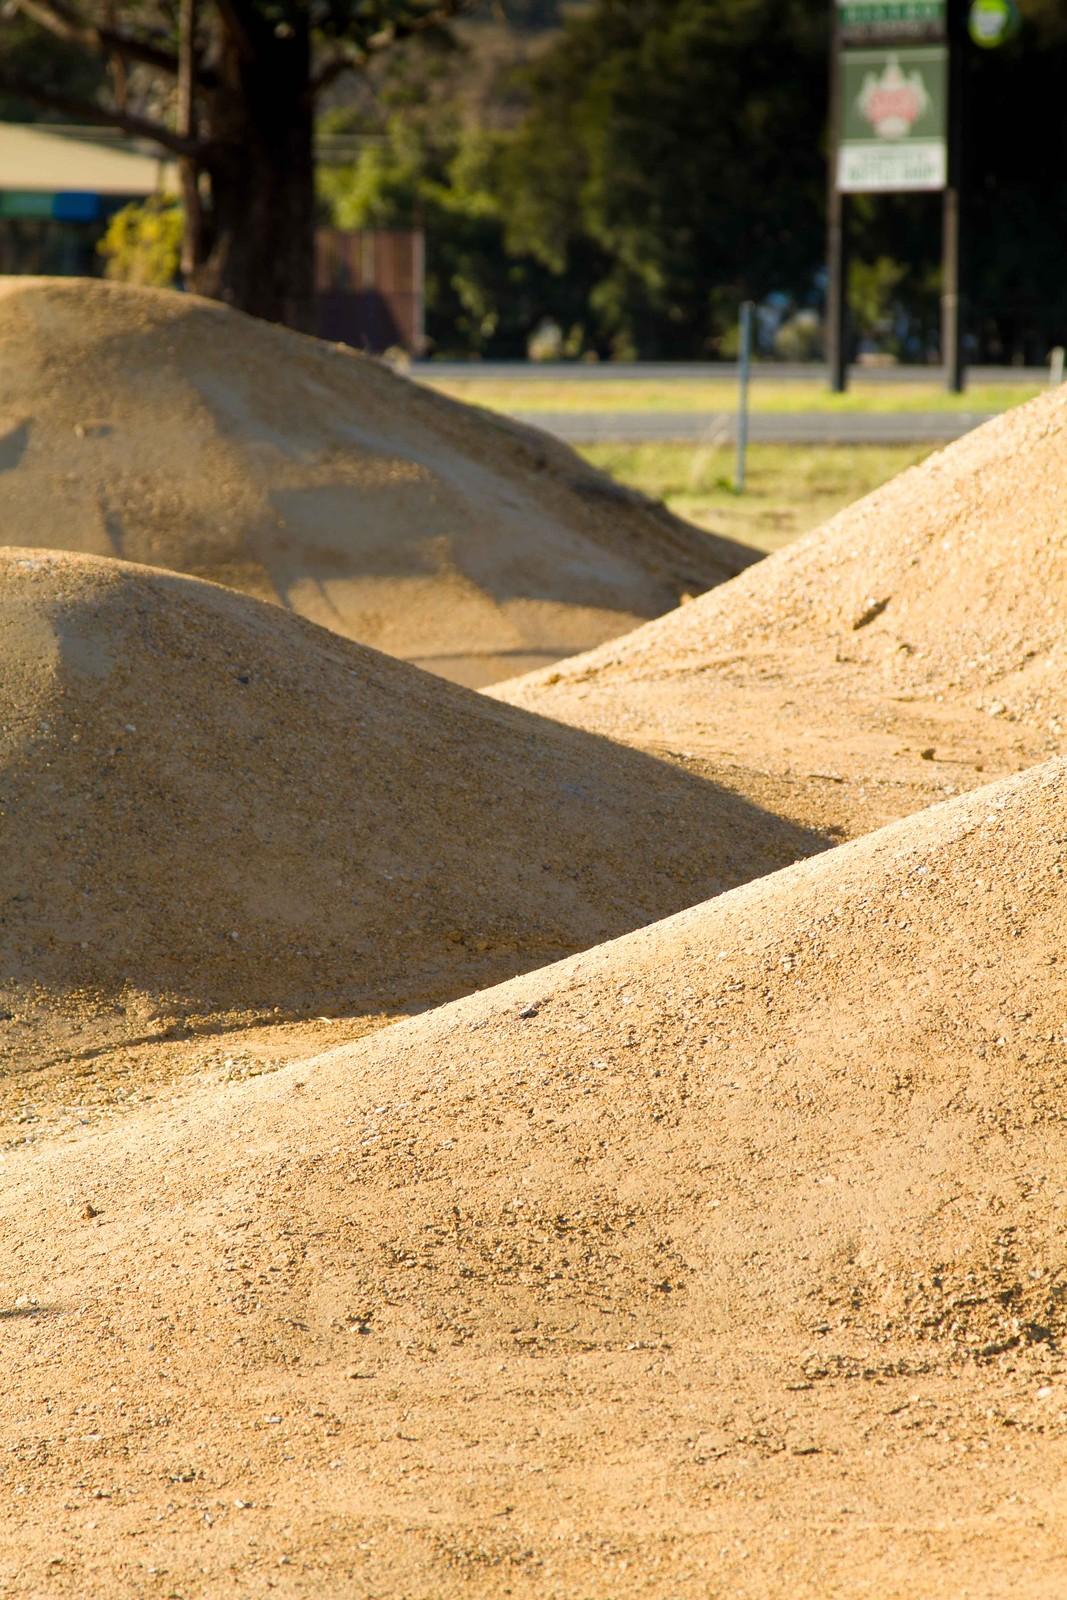 DirtArt  Triabuna ends - FourHills - Mountain Biking Pictures - Vital MTB